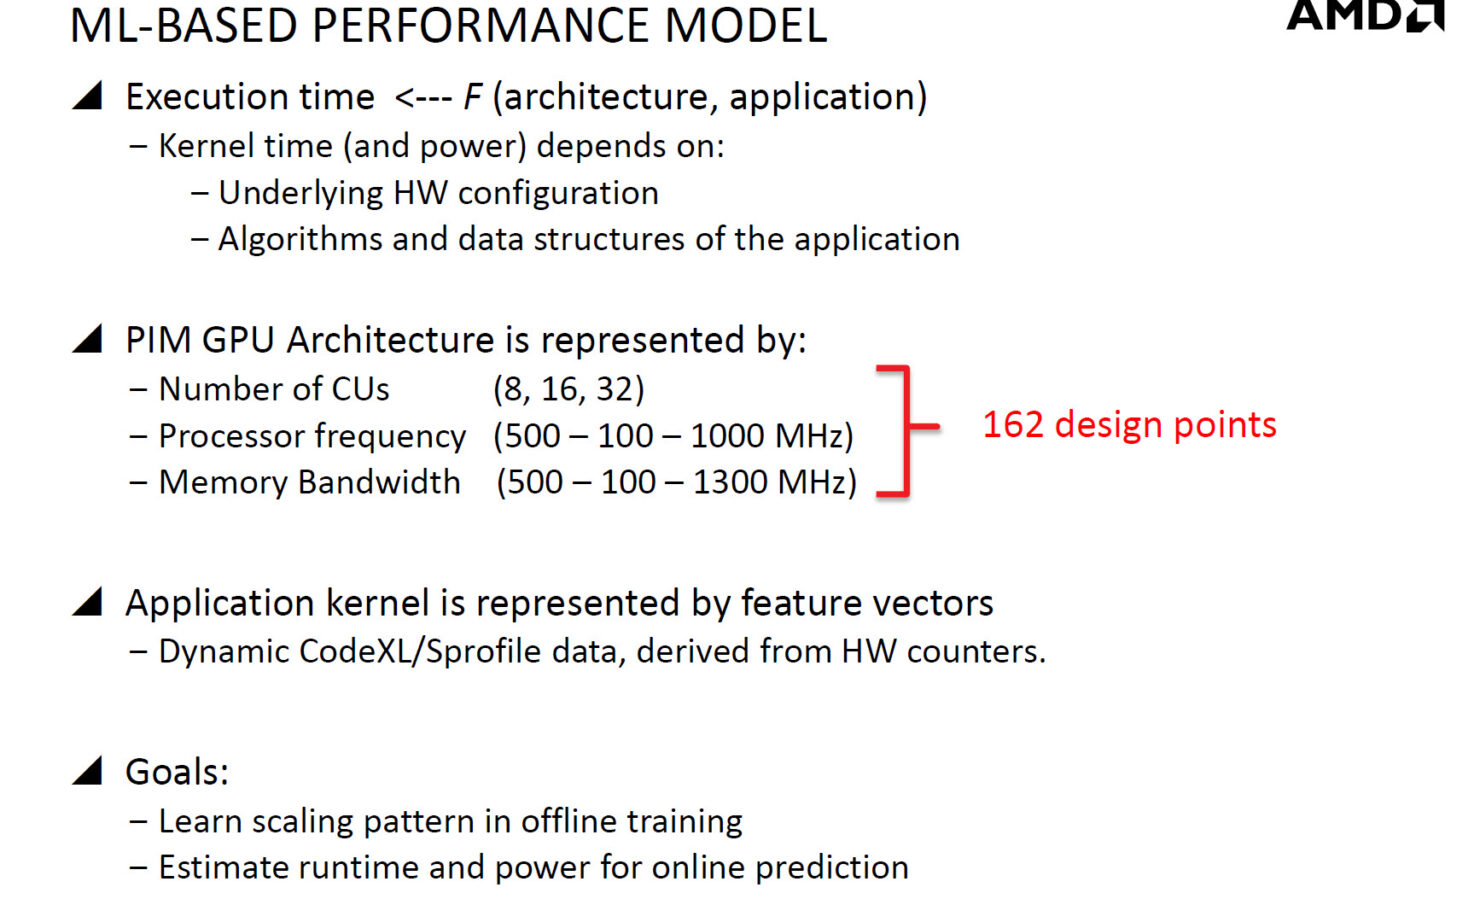 amd-performance-model-ml-based